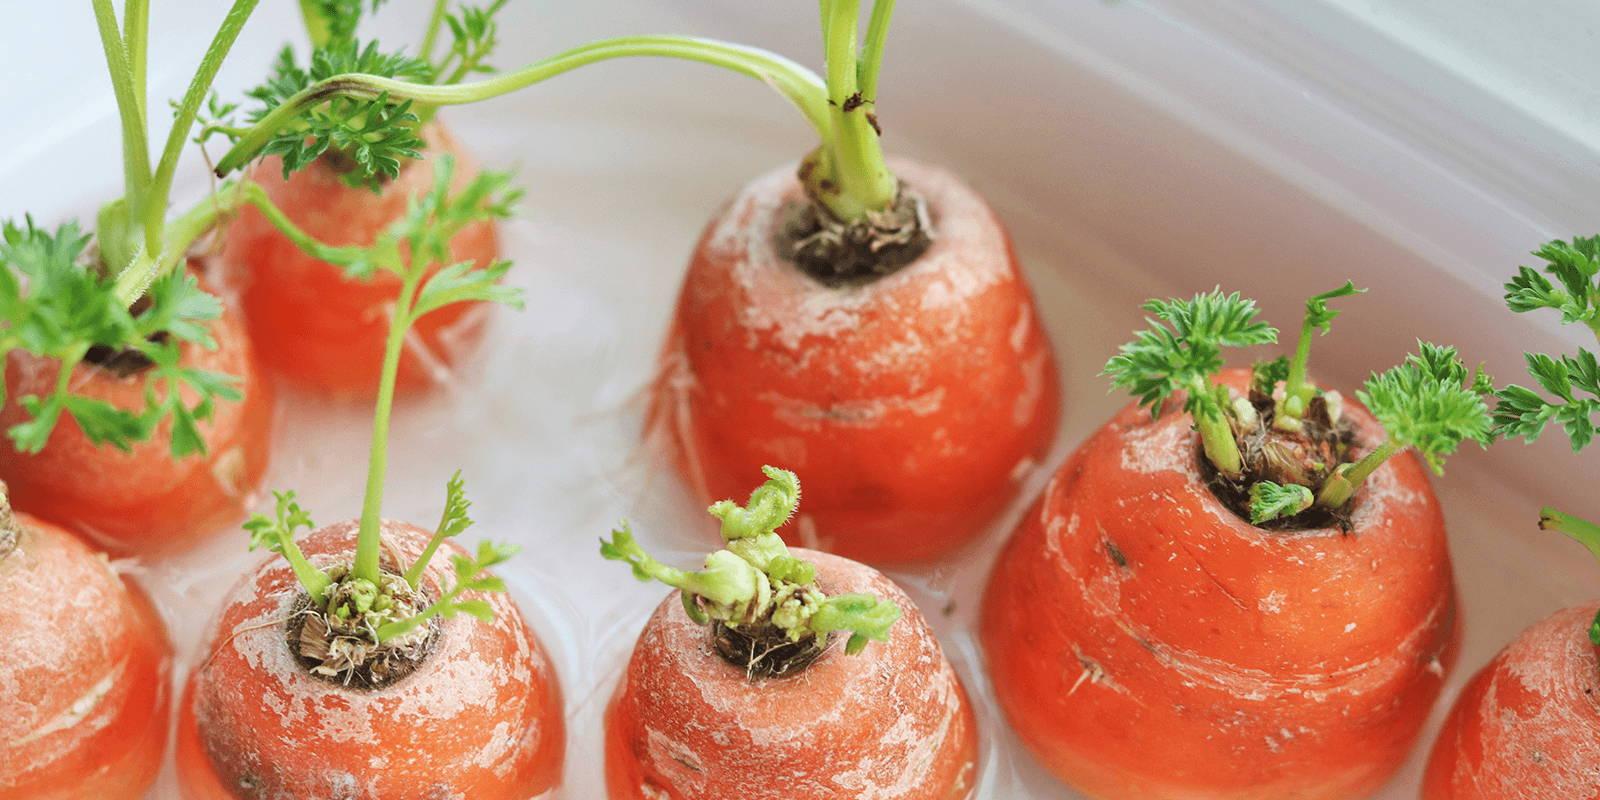 Carrot tops in water.